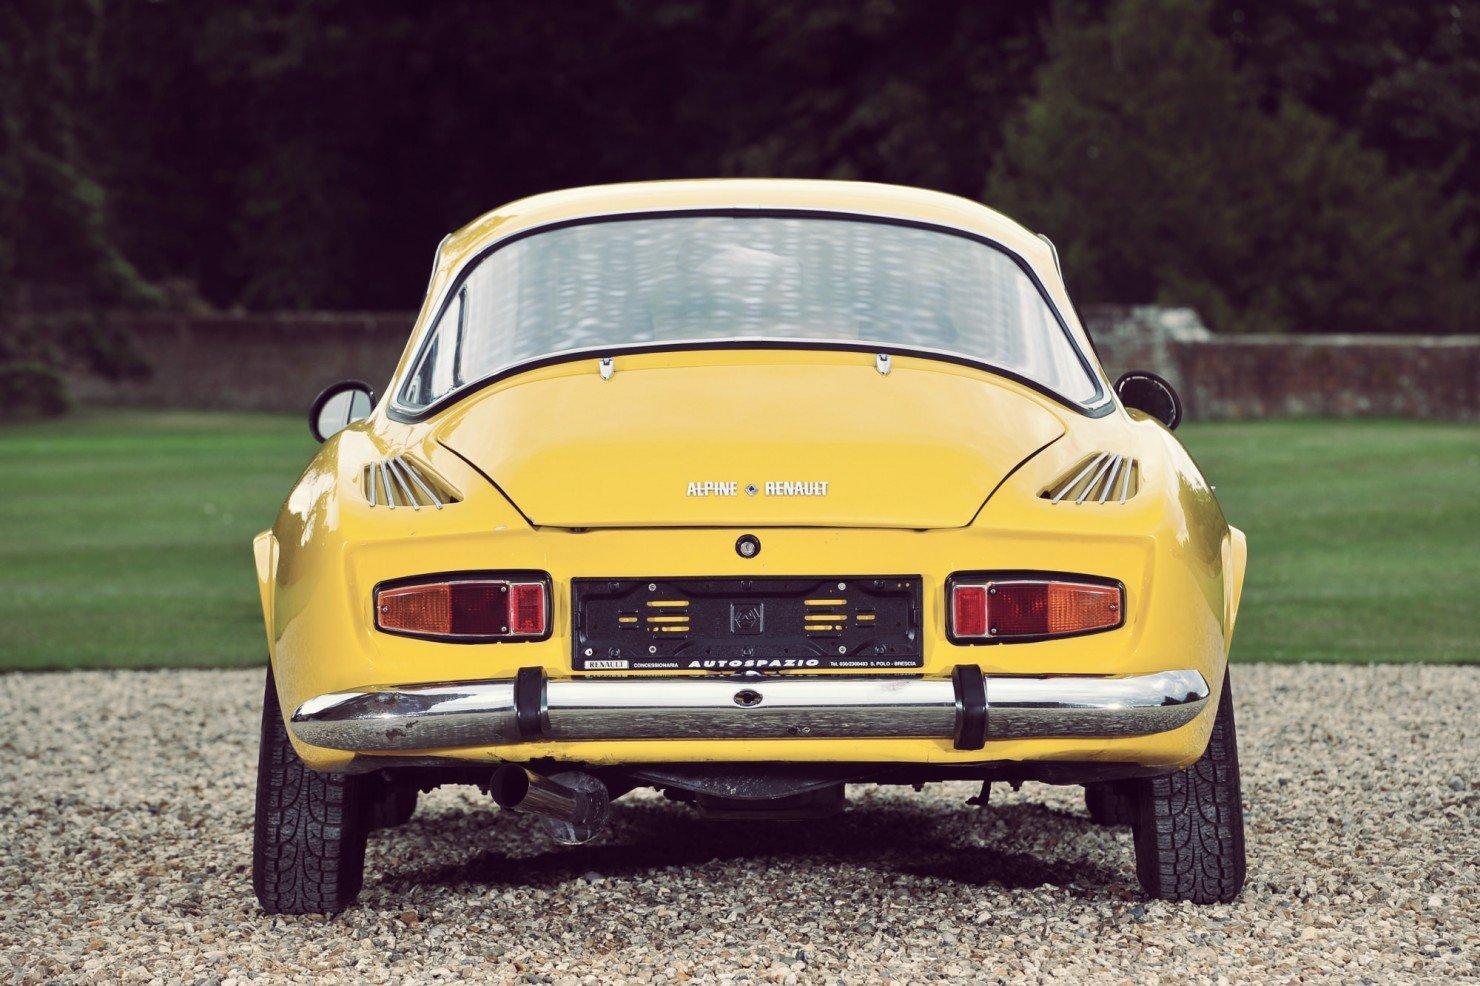 Alpine A110 Car 11 1480x986 Alpine Renault A110